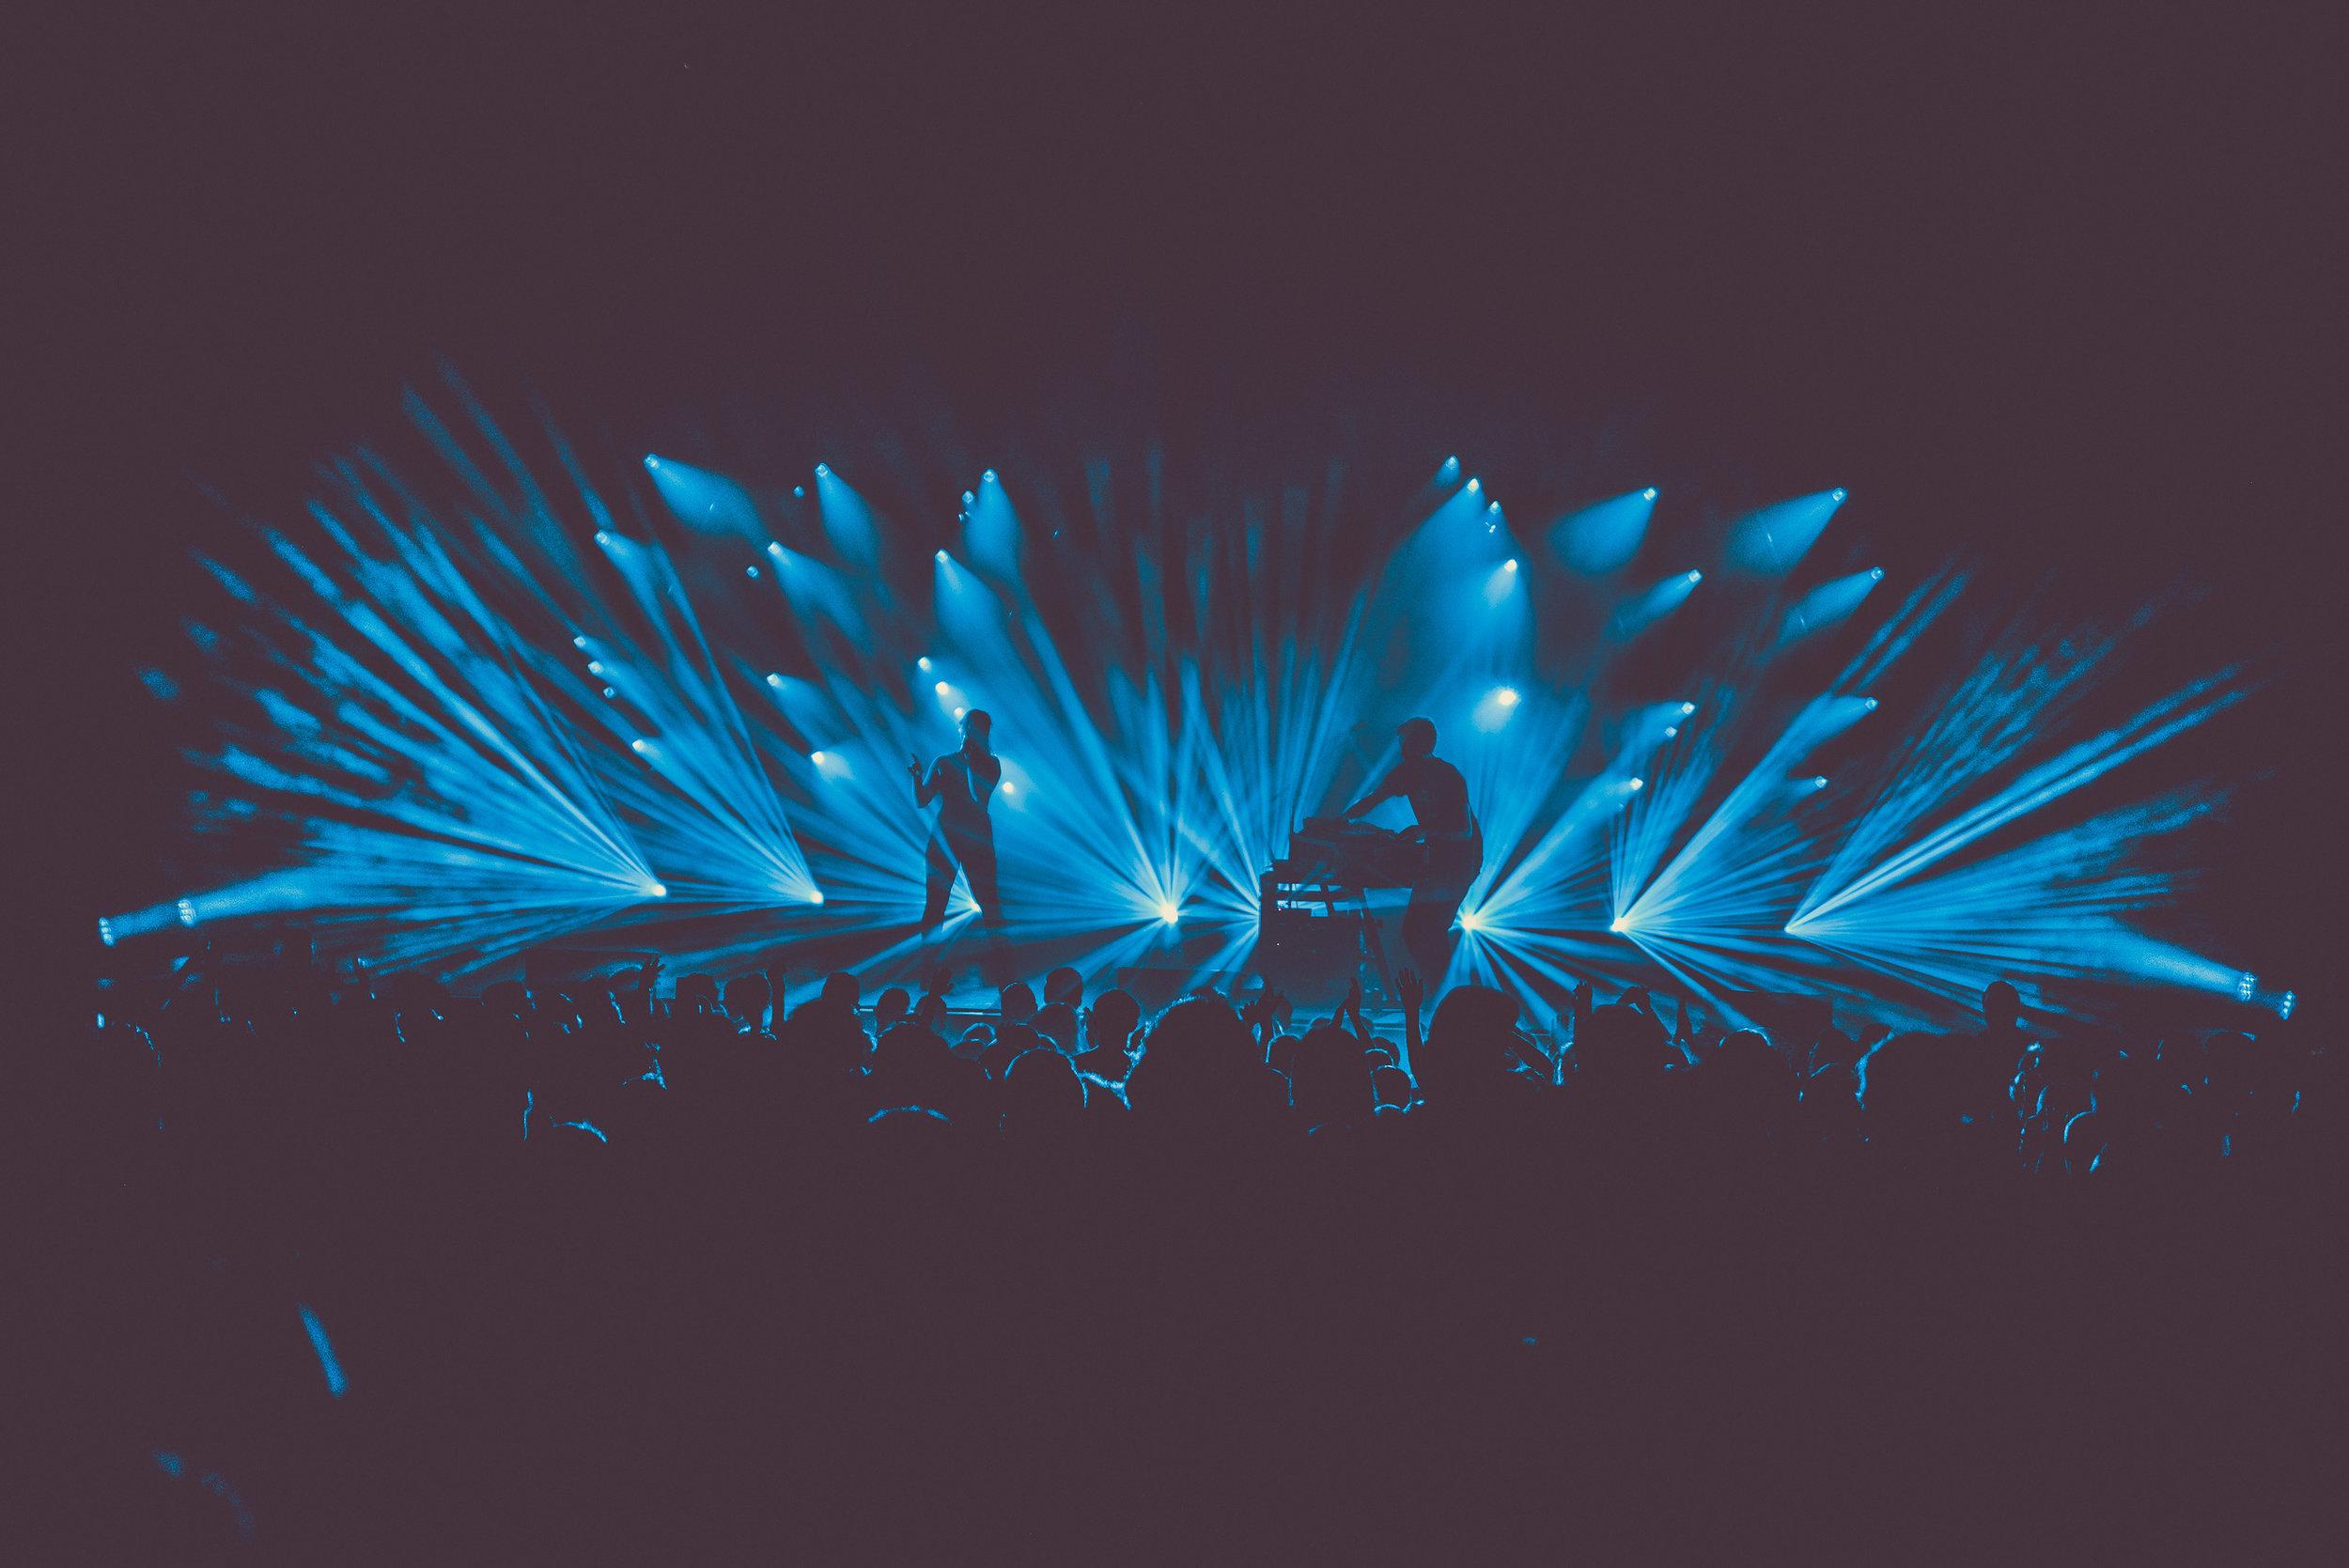 SylvanEsso-FoxTheater-Oakland-082217-ErikaReinsel-17.jpg